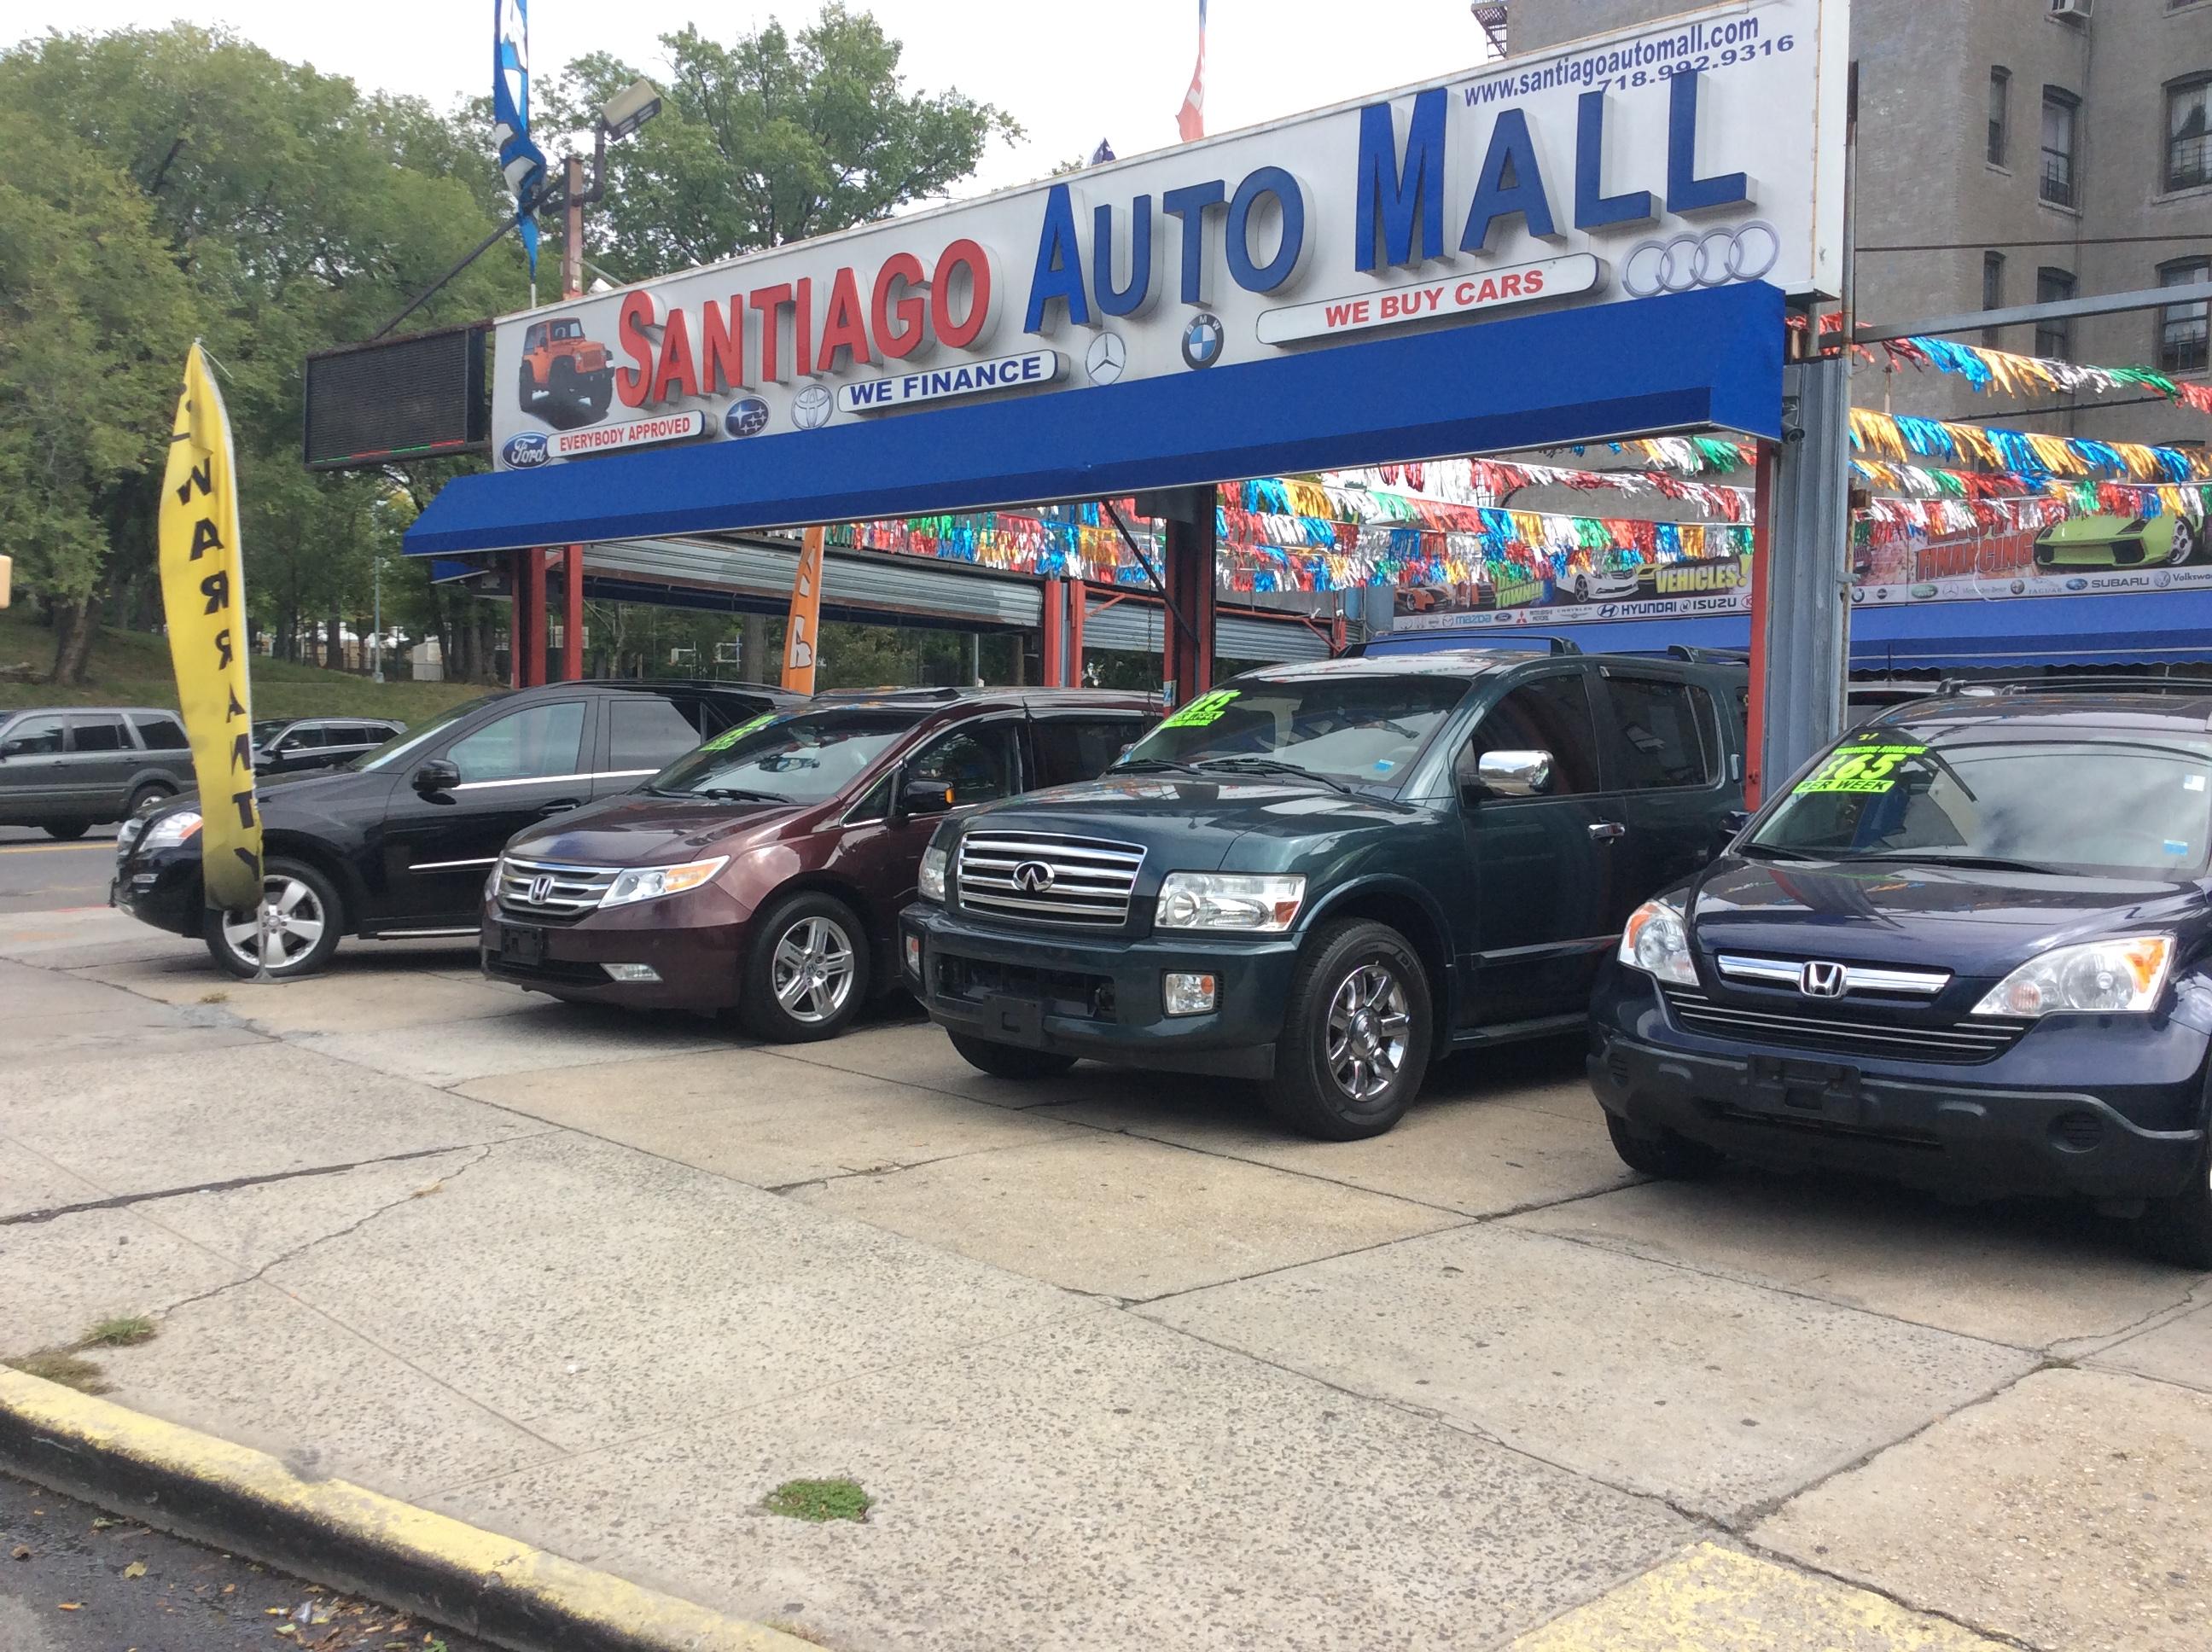 Santiago Auto Mall image 2